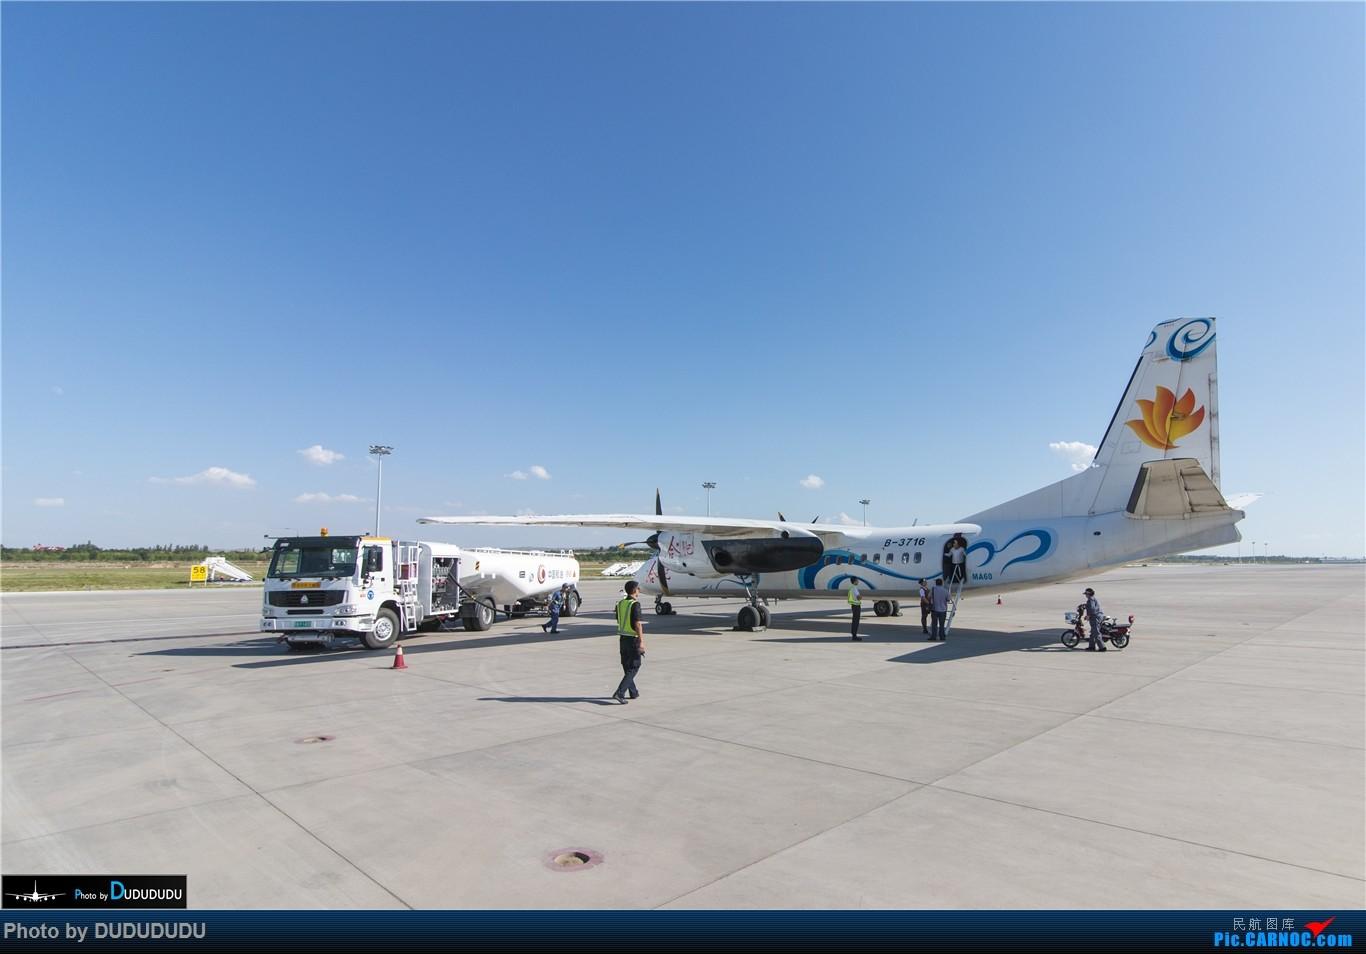 Re:[原创]【DUDUDUDU】暑期飞行合集 从A388到MA60 XIAN AIRCRAFT MA 60 B-3716 中国银川河东国际机场